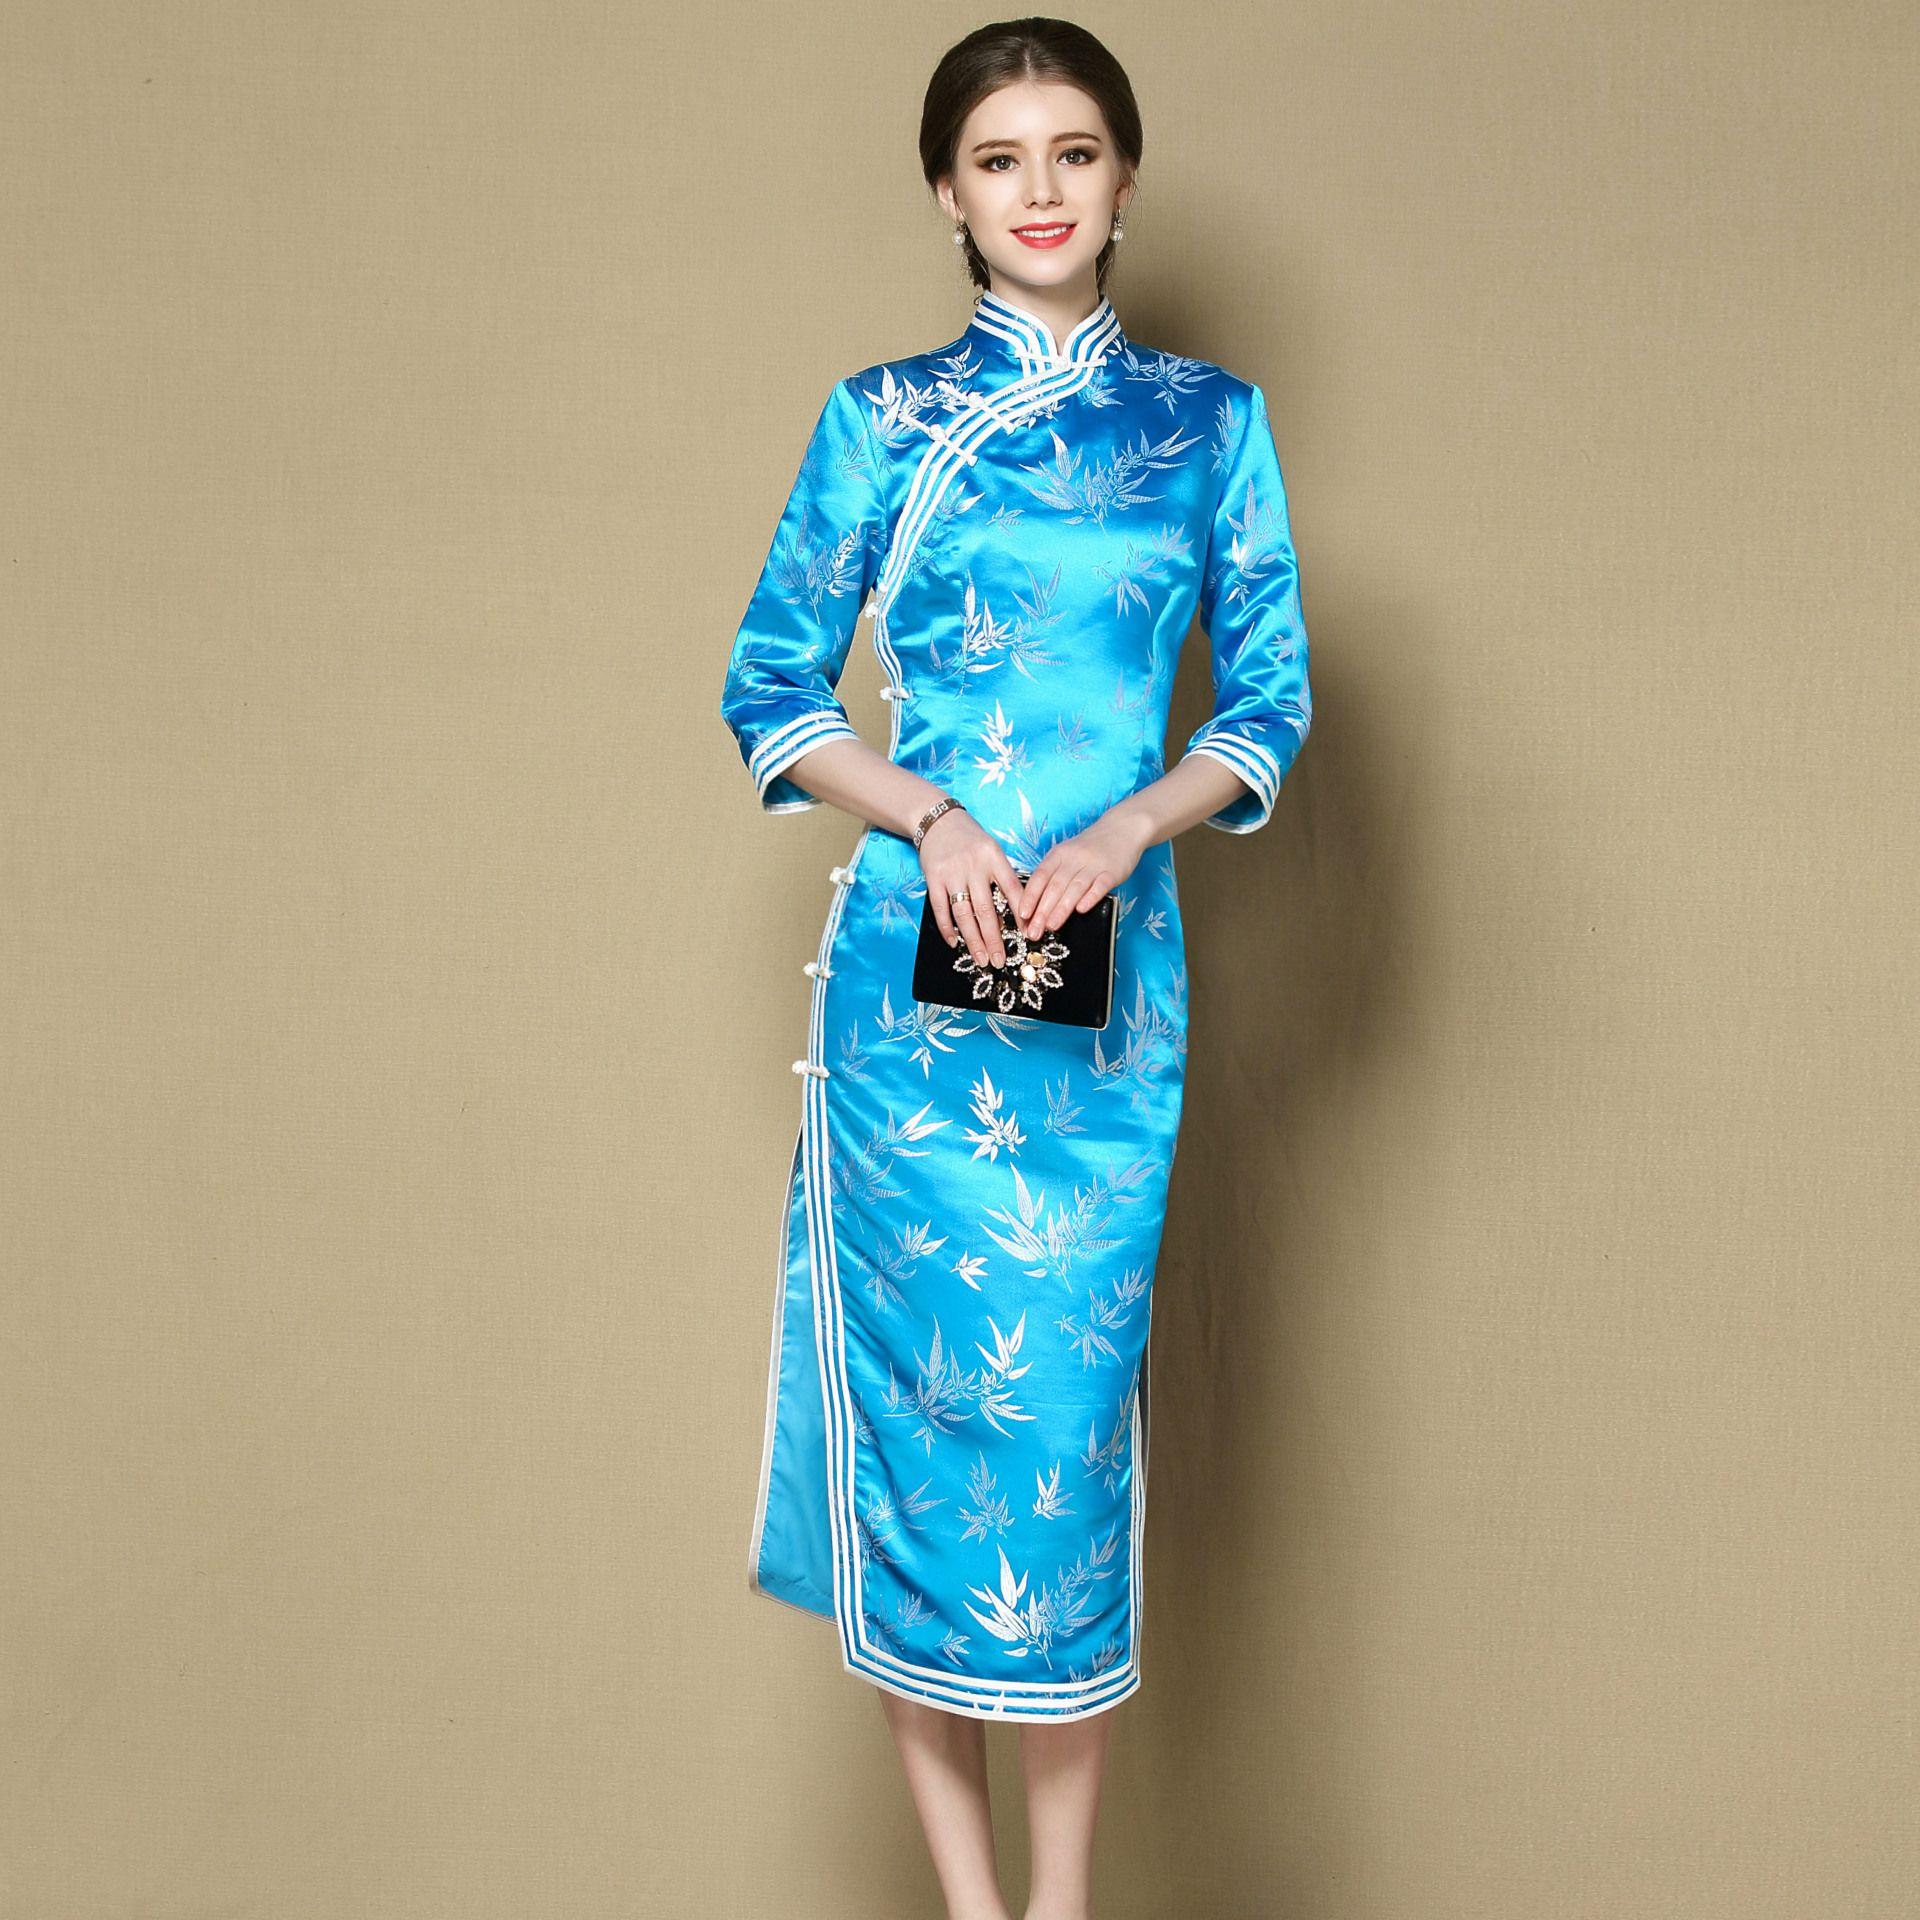 Enchanting Blue Brocade Qipao Cheongsam Dress